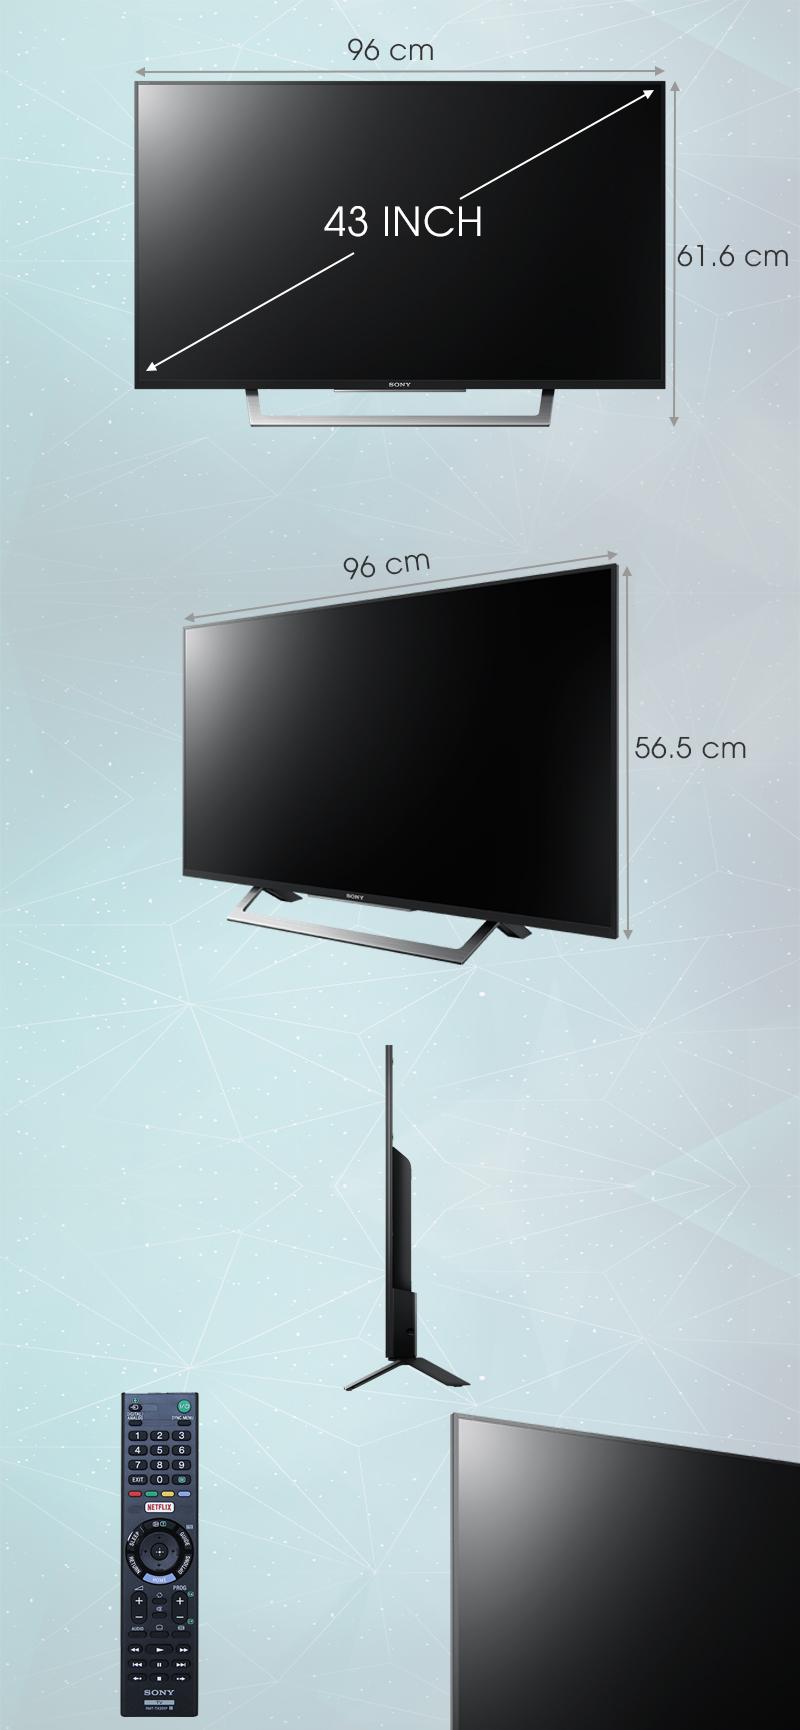 Internet Tivi Sony 43 inch KDL-43W750D - Kích thước tivi